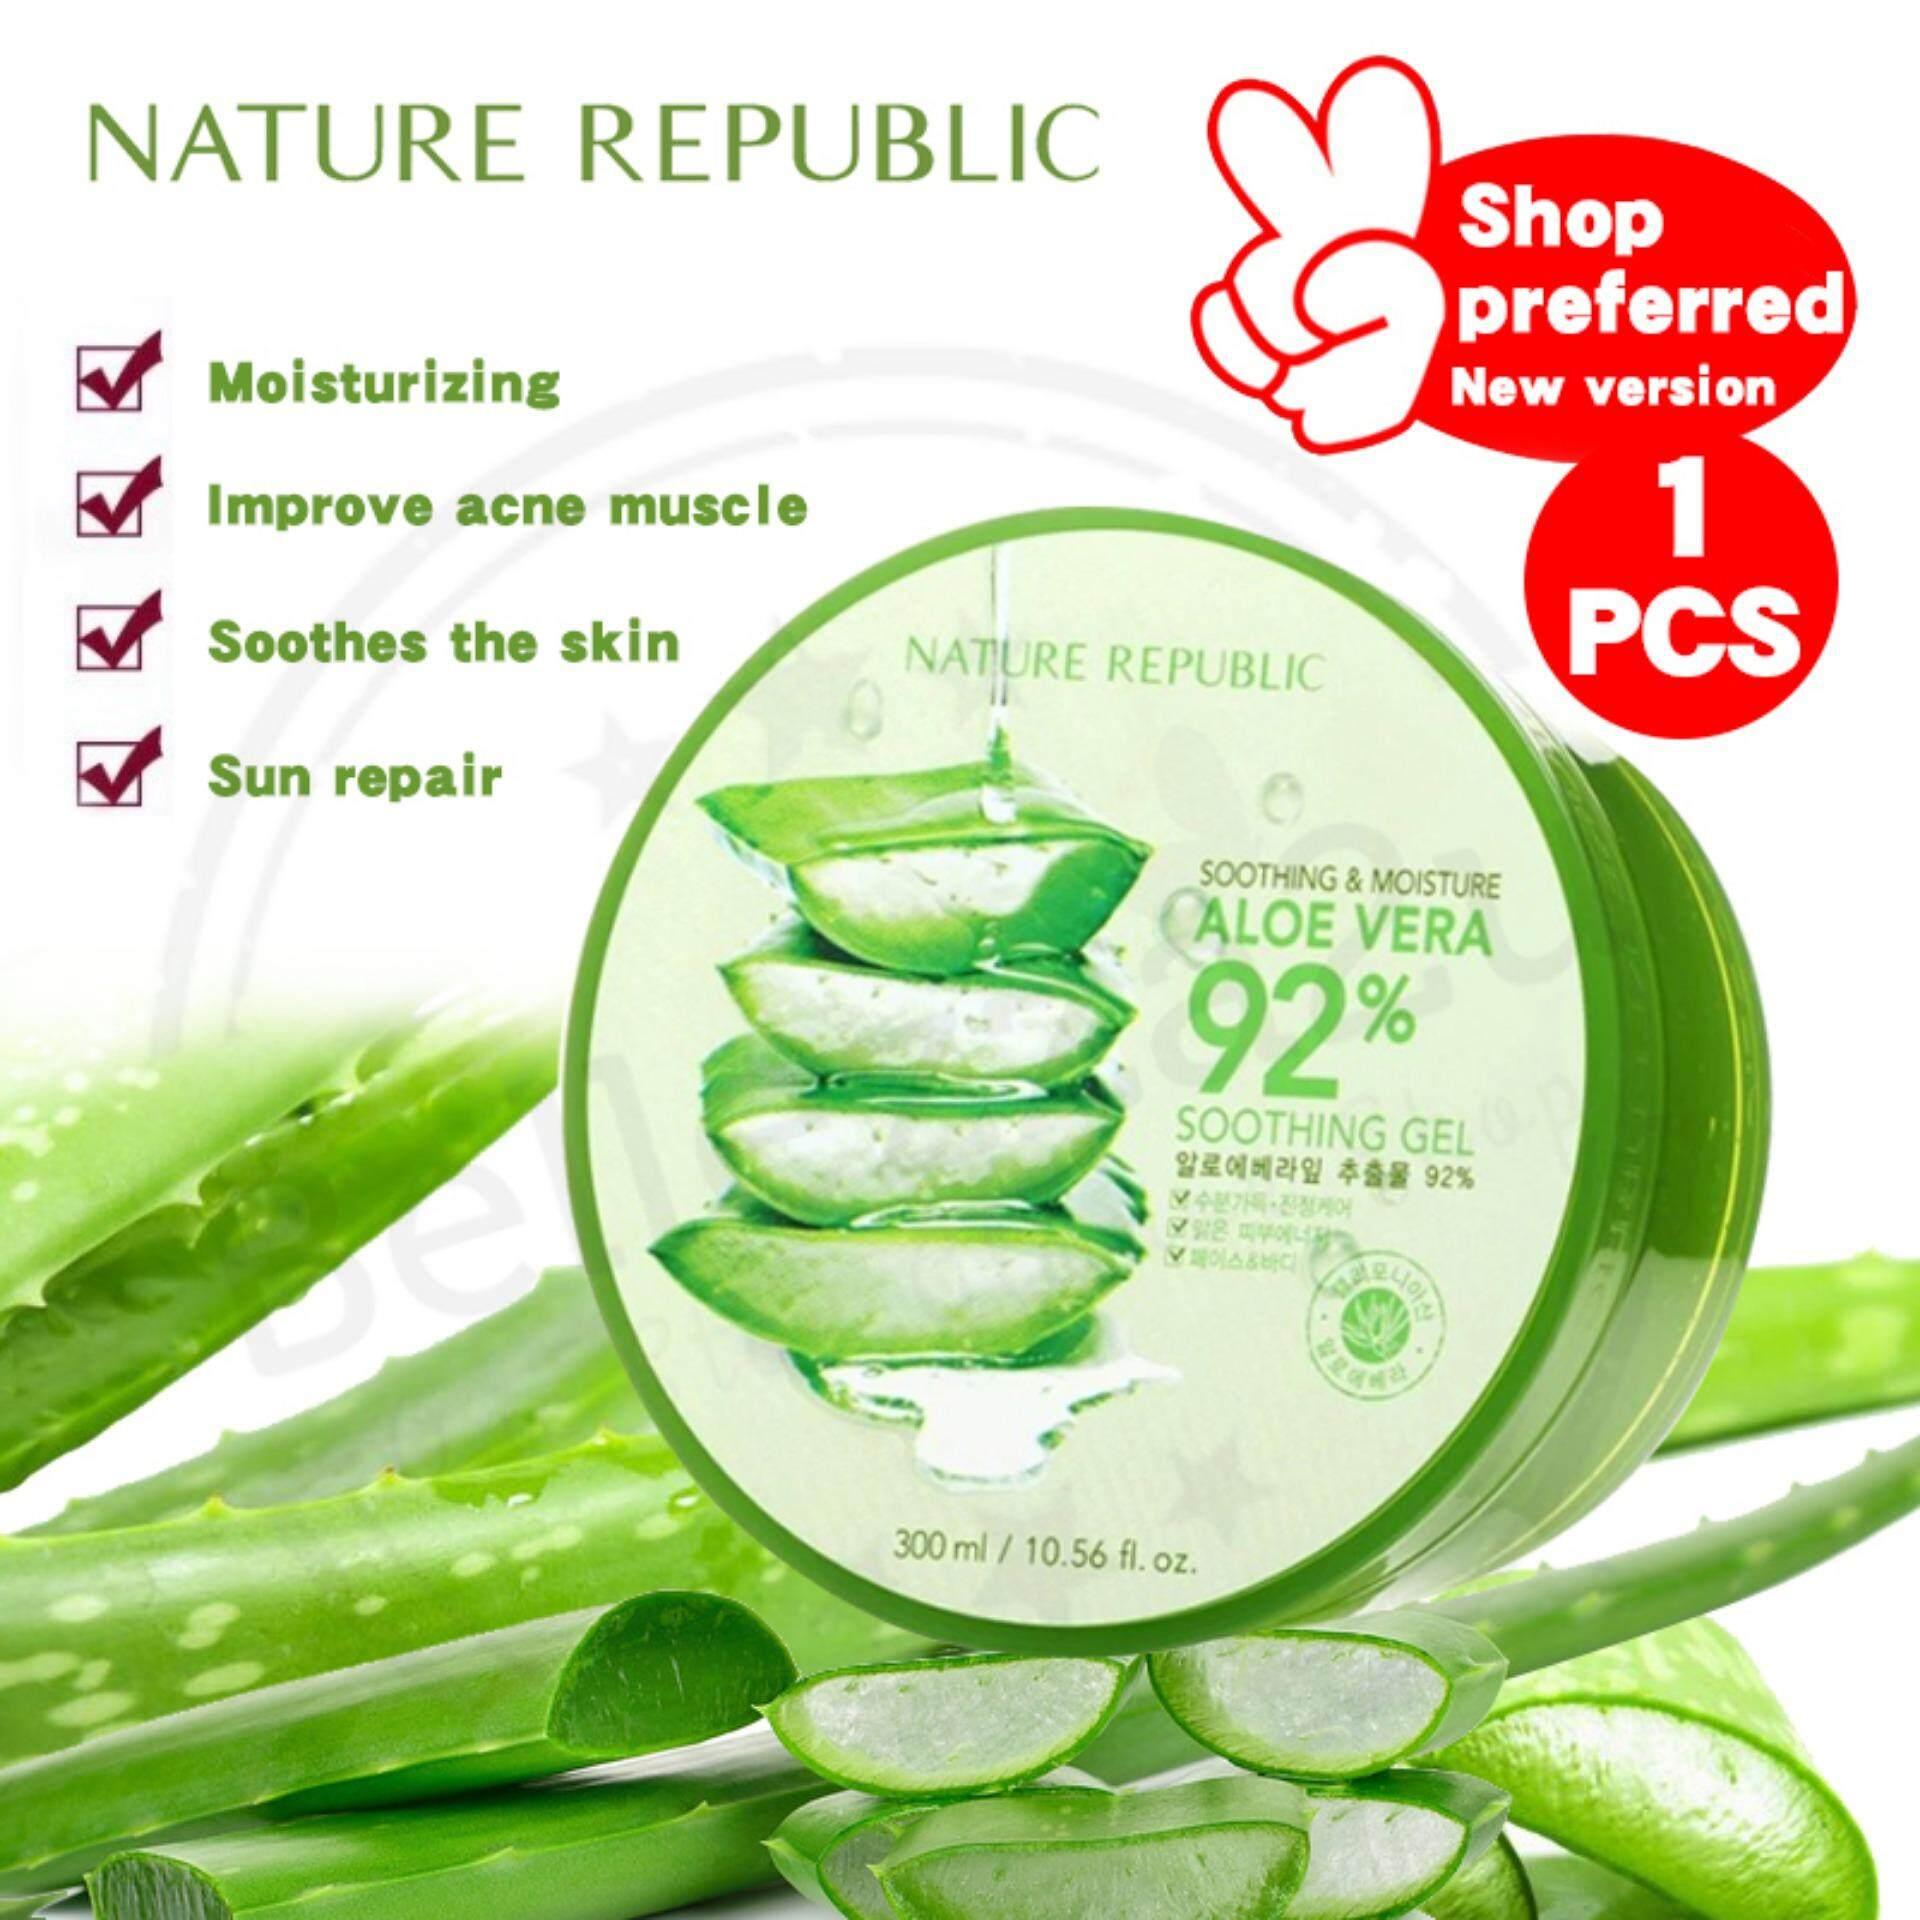 Fitur Nature Republic Aloe Vera Soothing Gel 92 Original Korea 300ml And Moisture